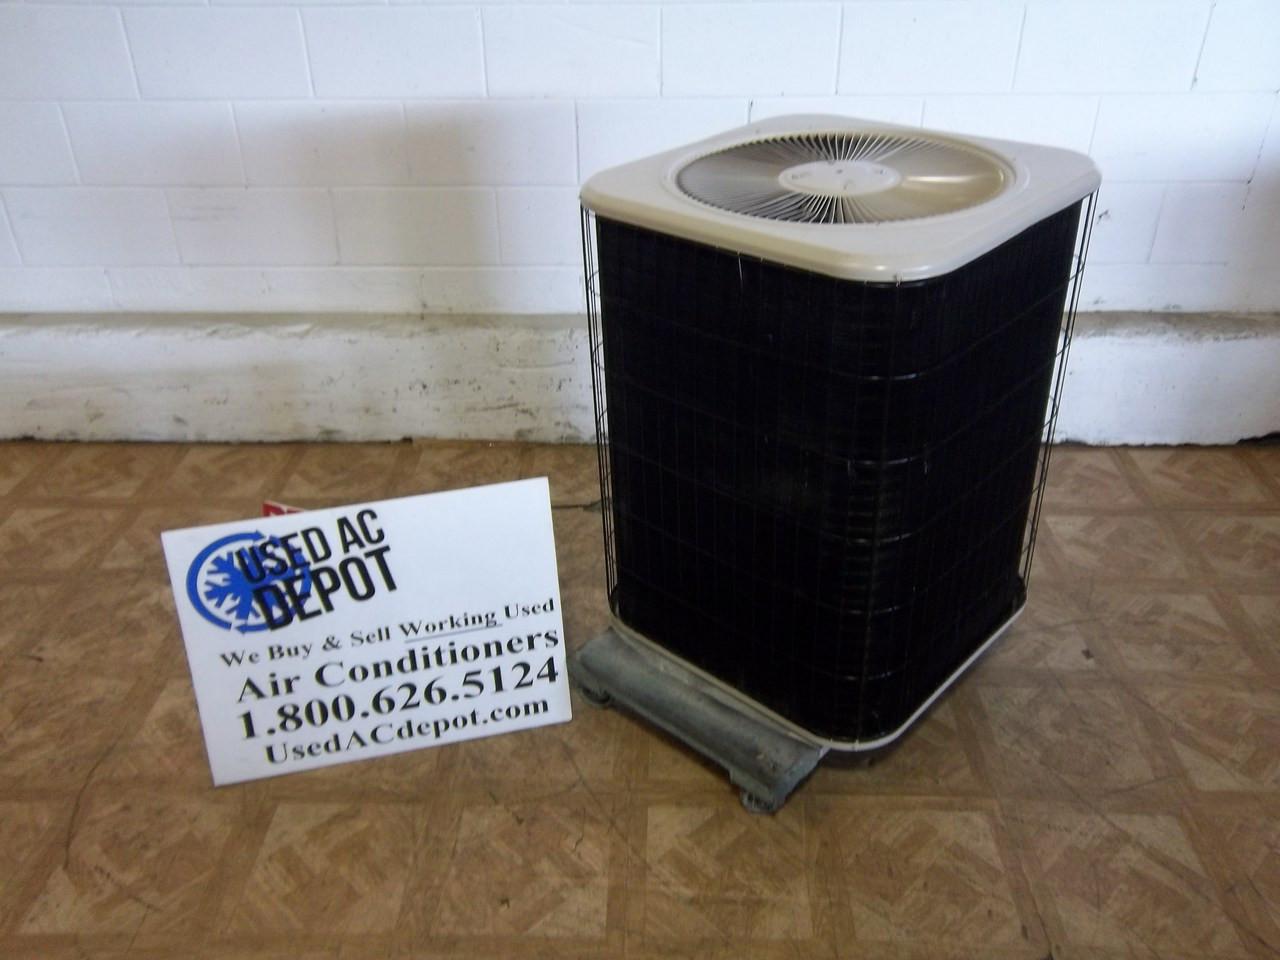 LENNOX Used AC Condenser 10HPB48-10P 1M